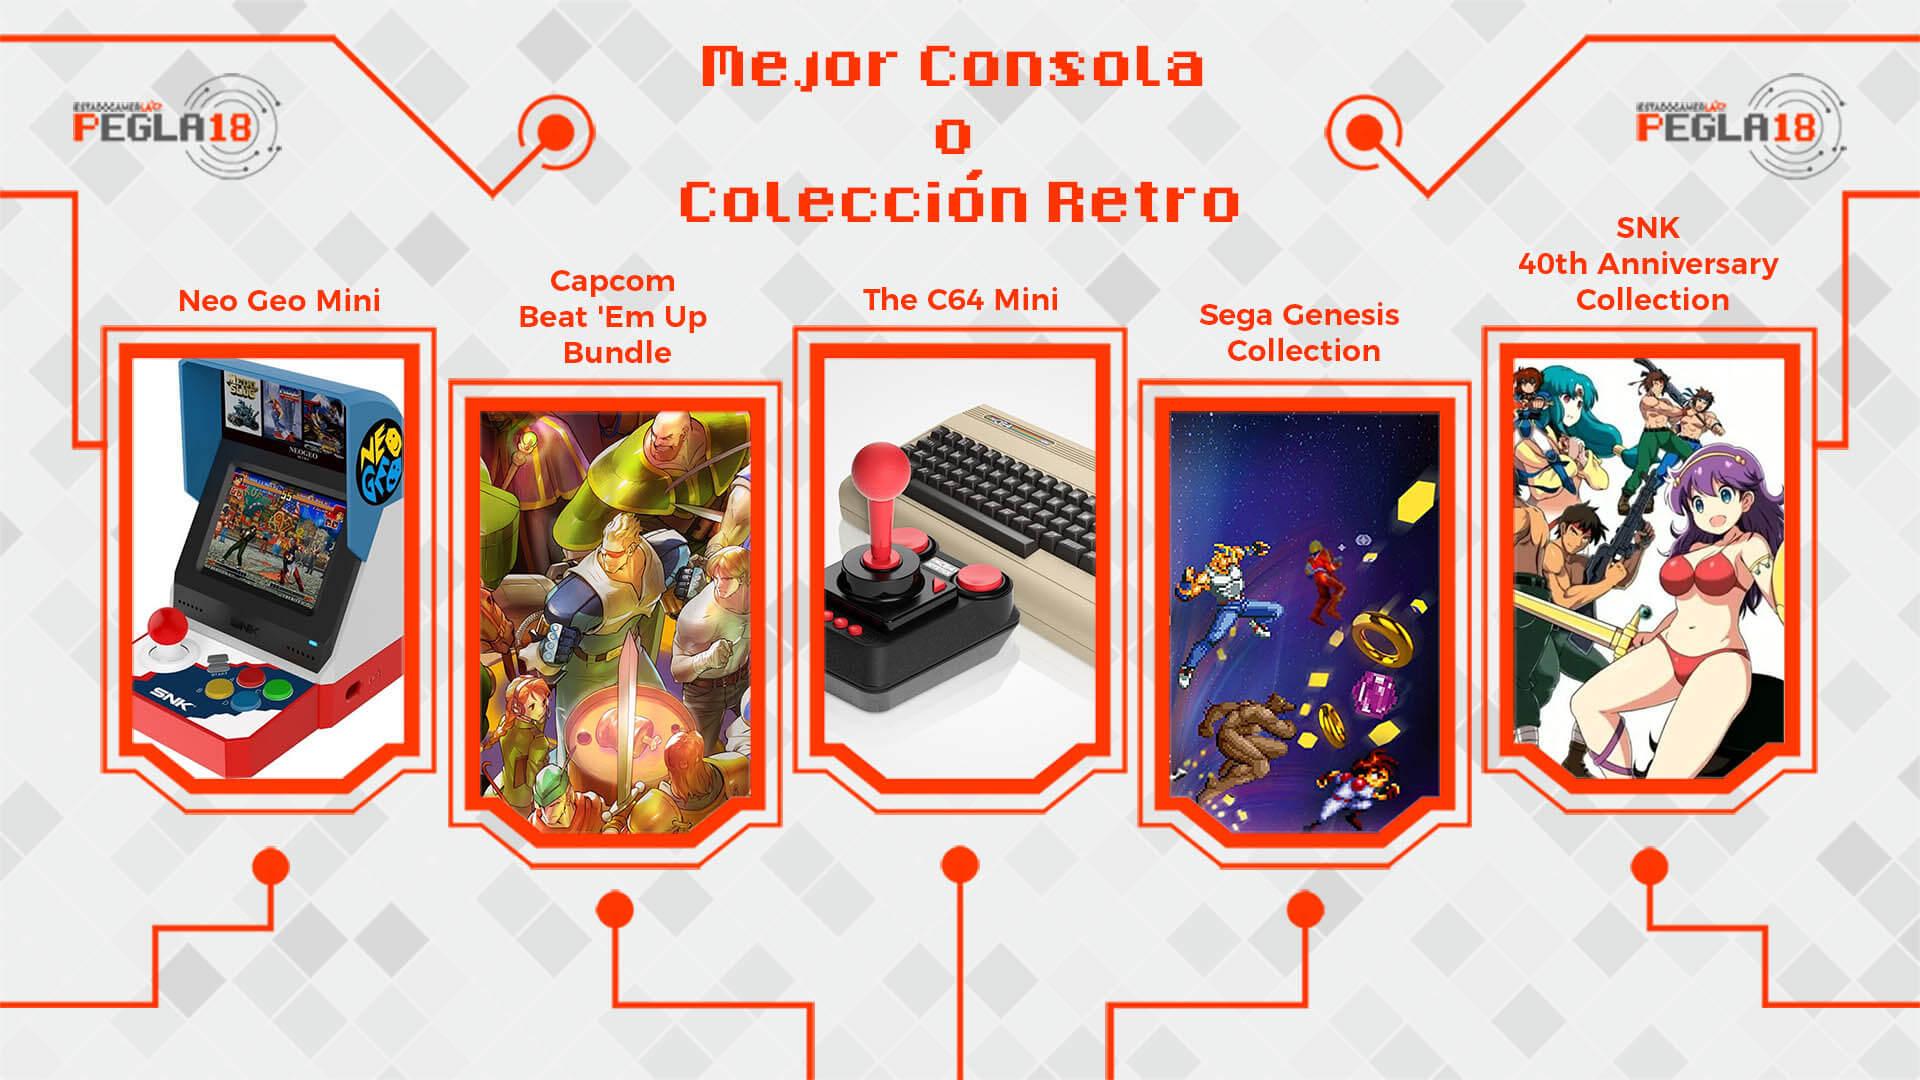 Premios EGLA 2018 Mejor Consola o Colección Retro